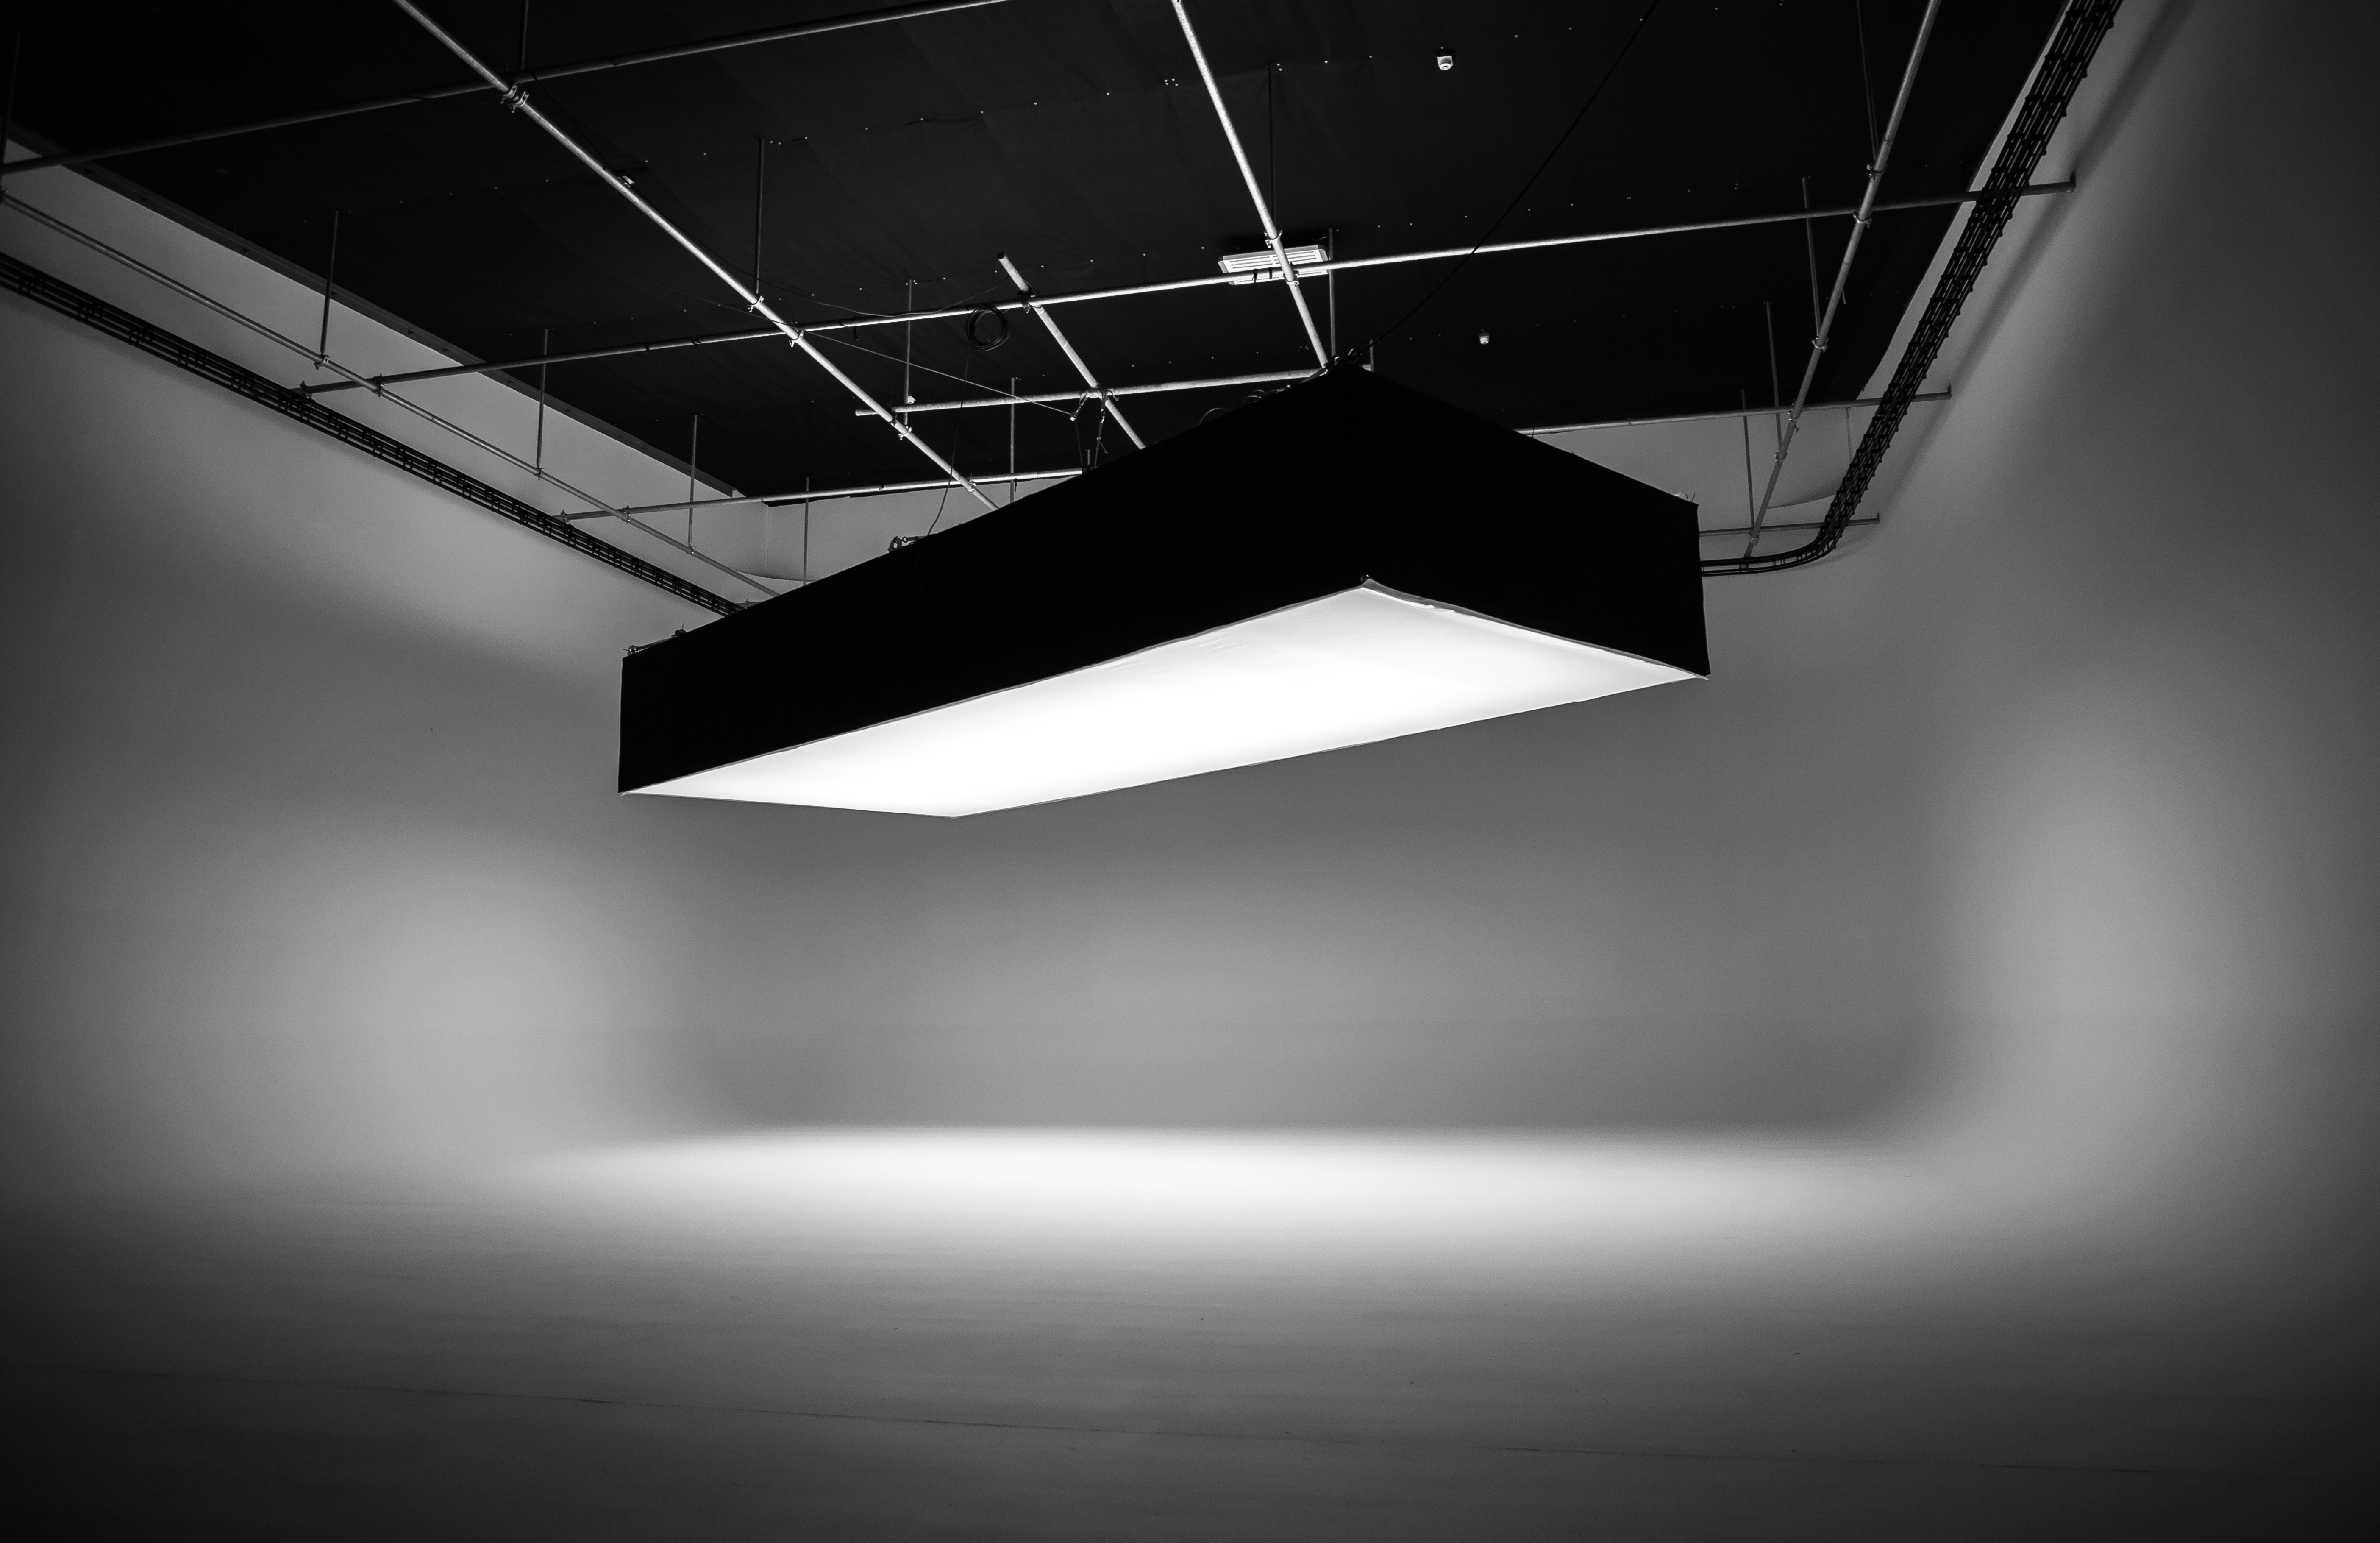 Lightbox2.0 (1 of 1)